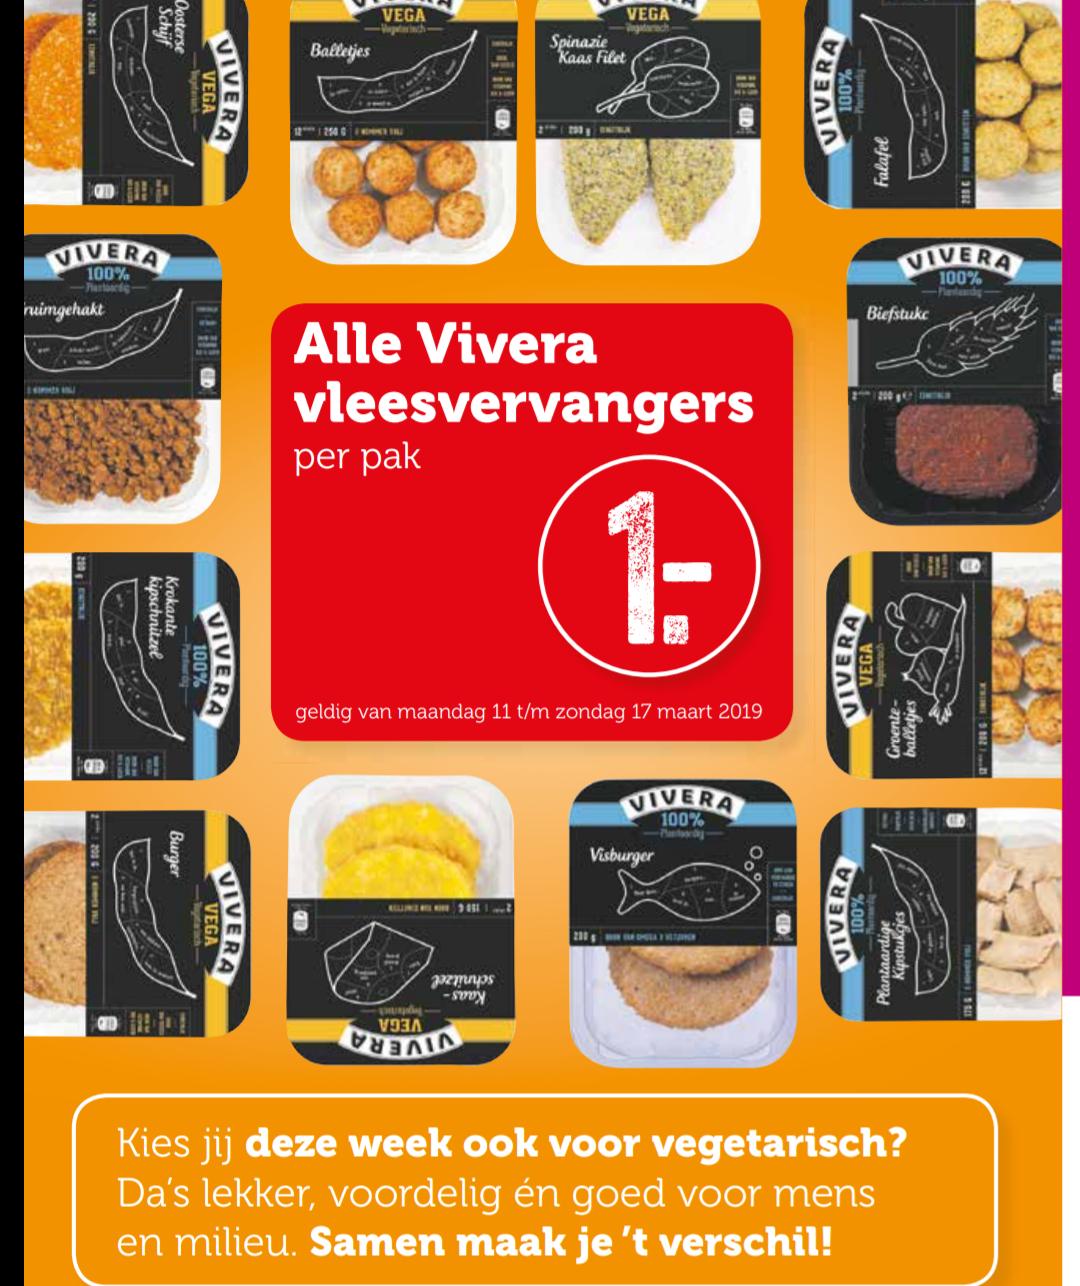 Alle Vivera vleesvervangers €1 bij Coop (Week zonder vlees)